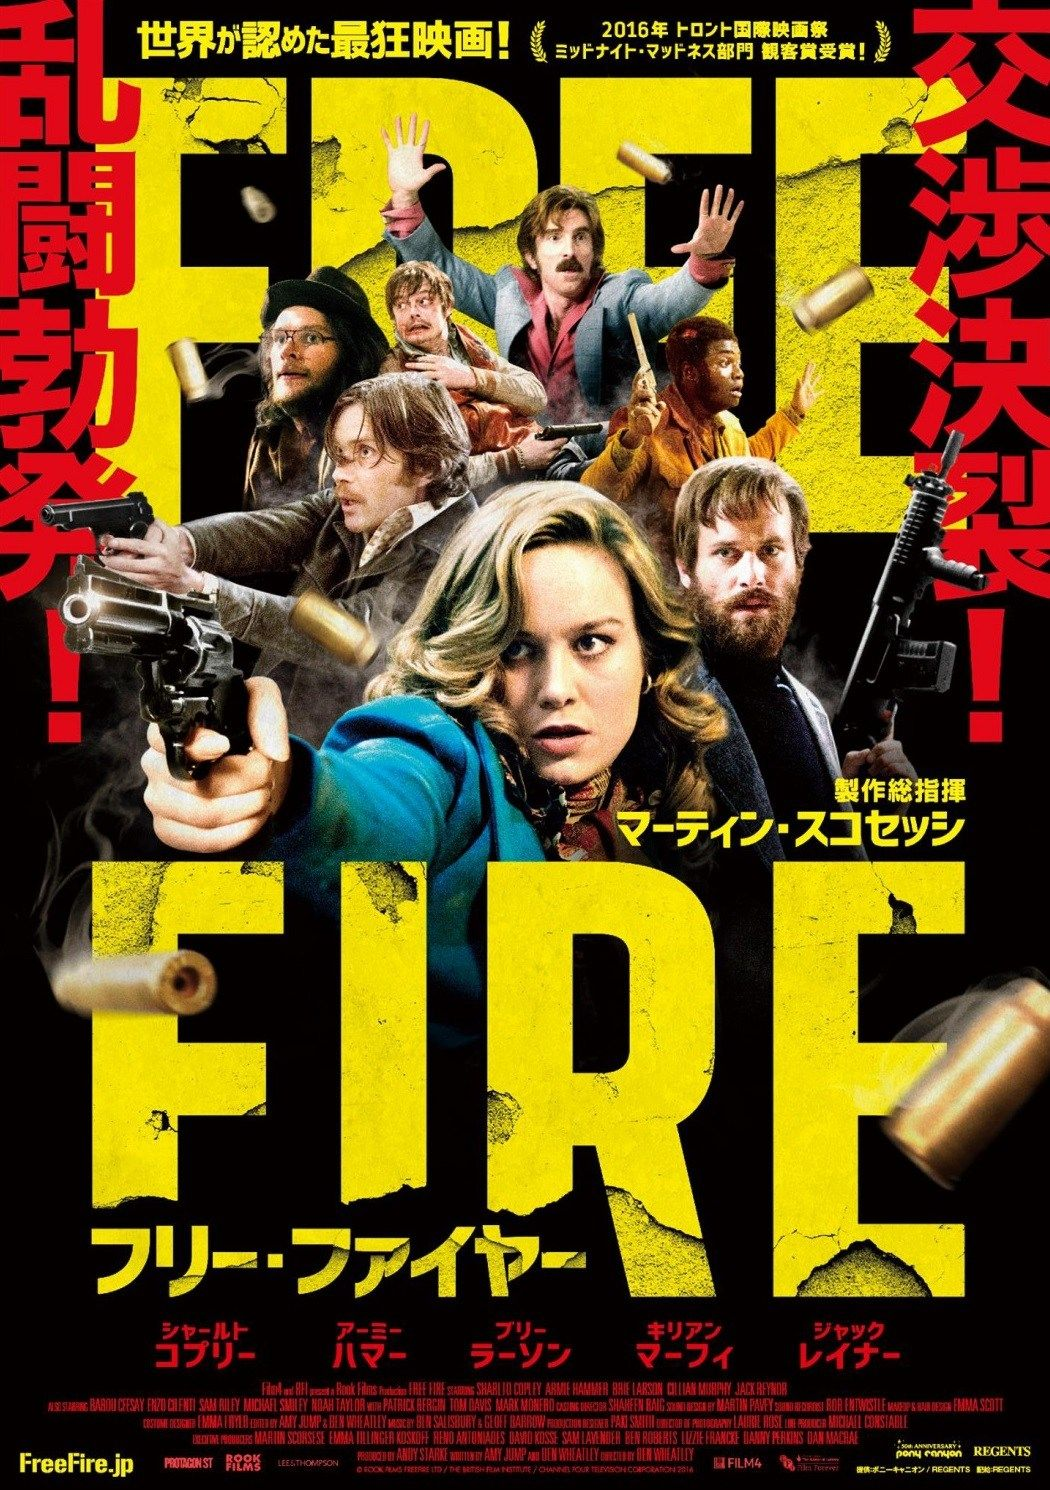 free fire pelicula completa en espa?ol latino